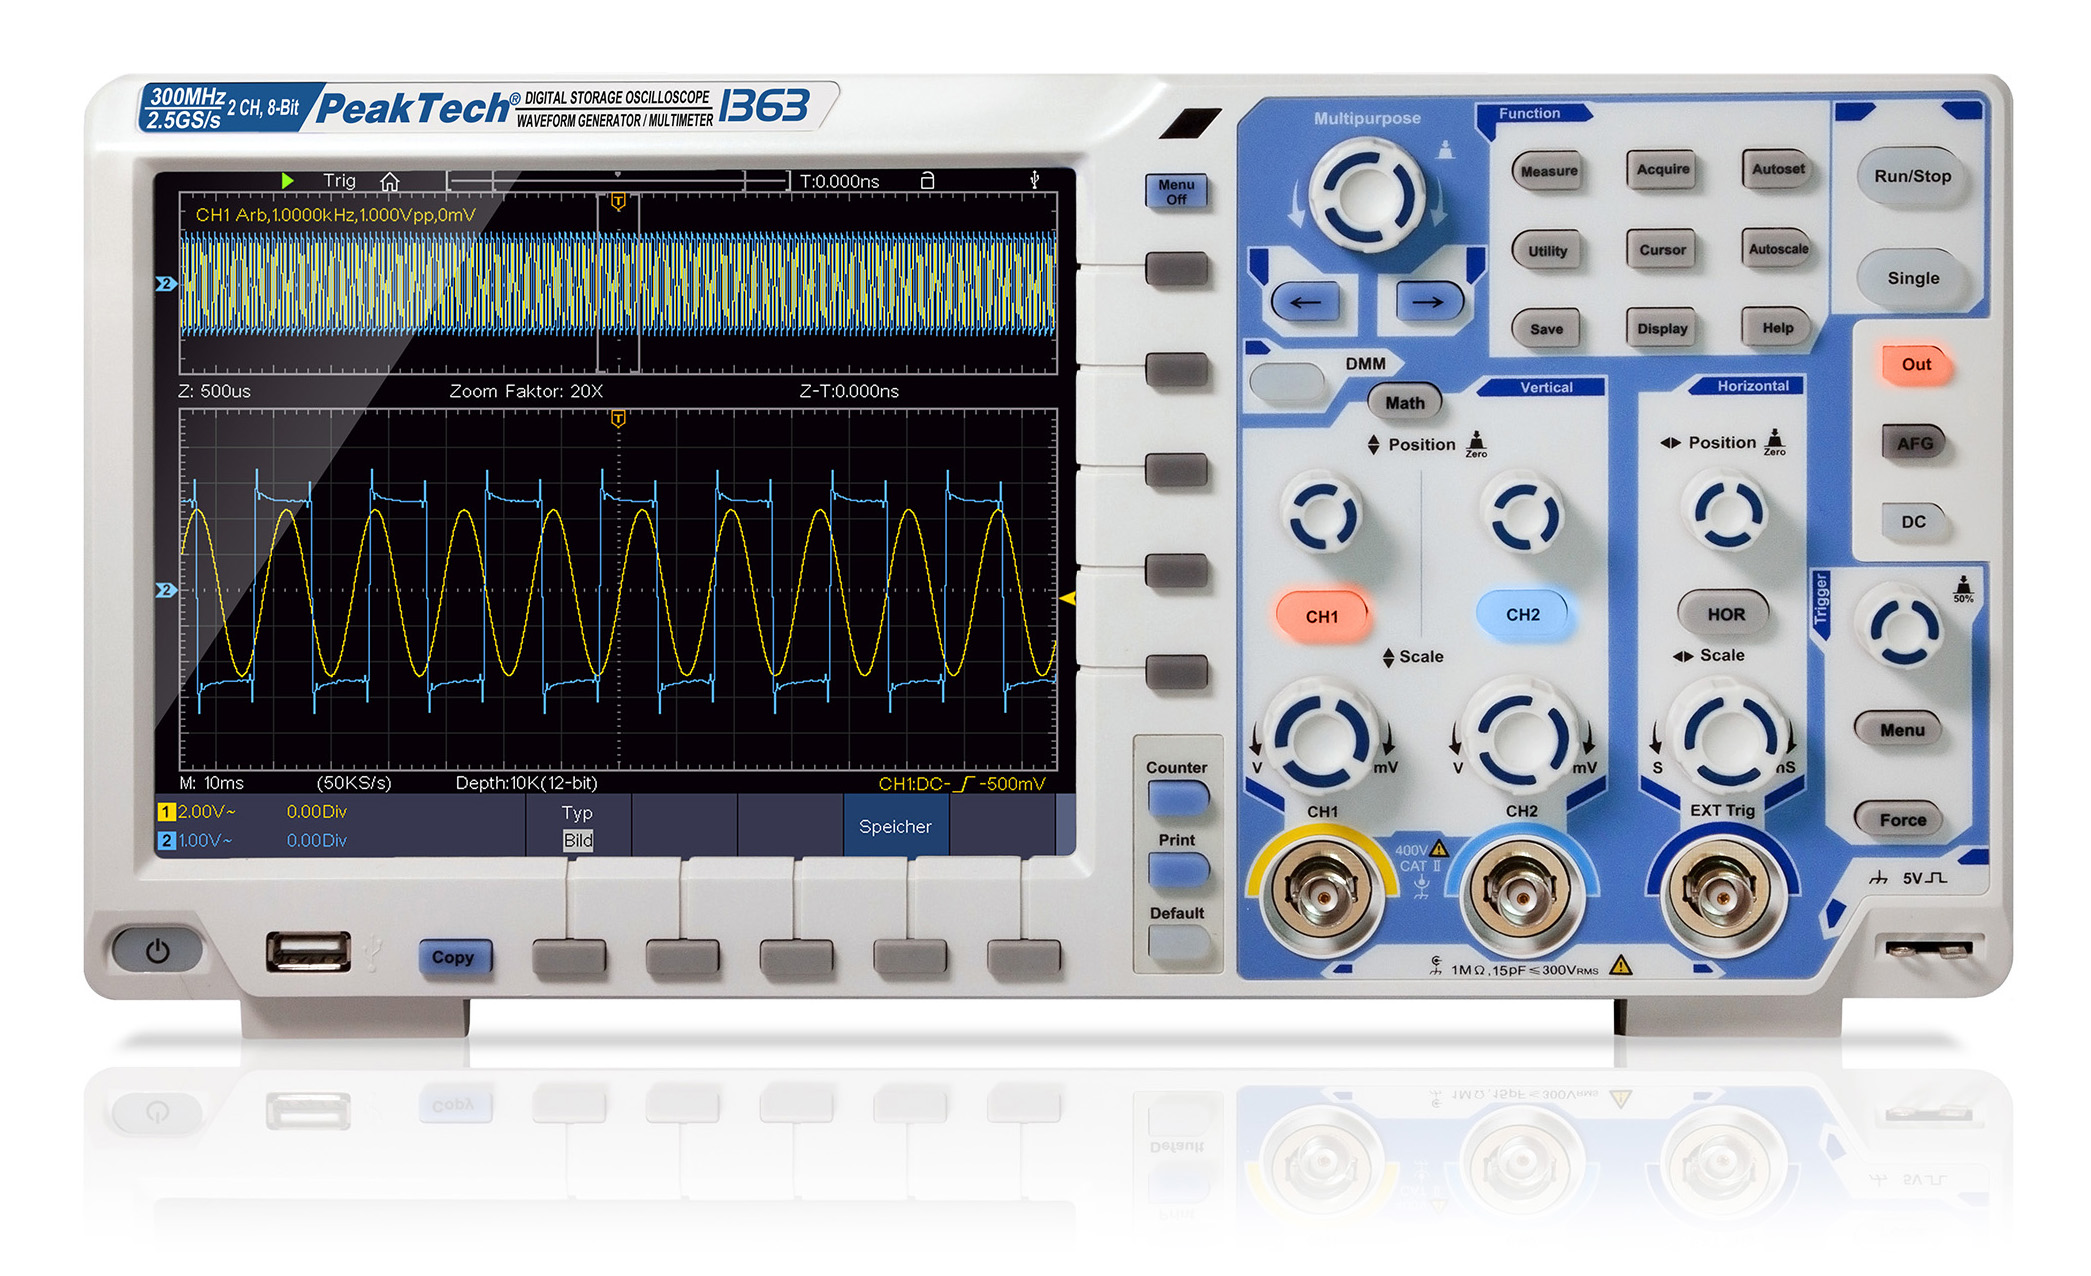 «PeakTech® P 1363» 300 MHz / 2 CH, 2.5 GS/s touchscreen oscilloscope